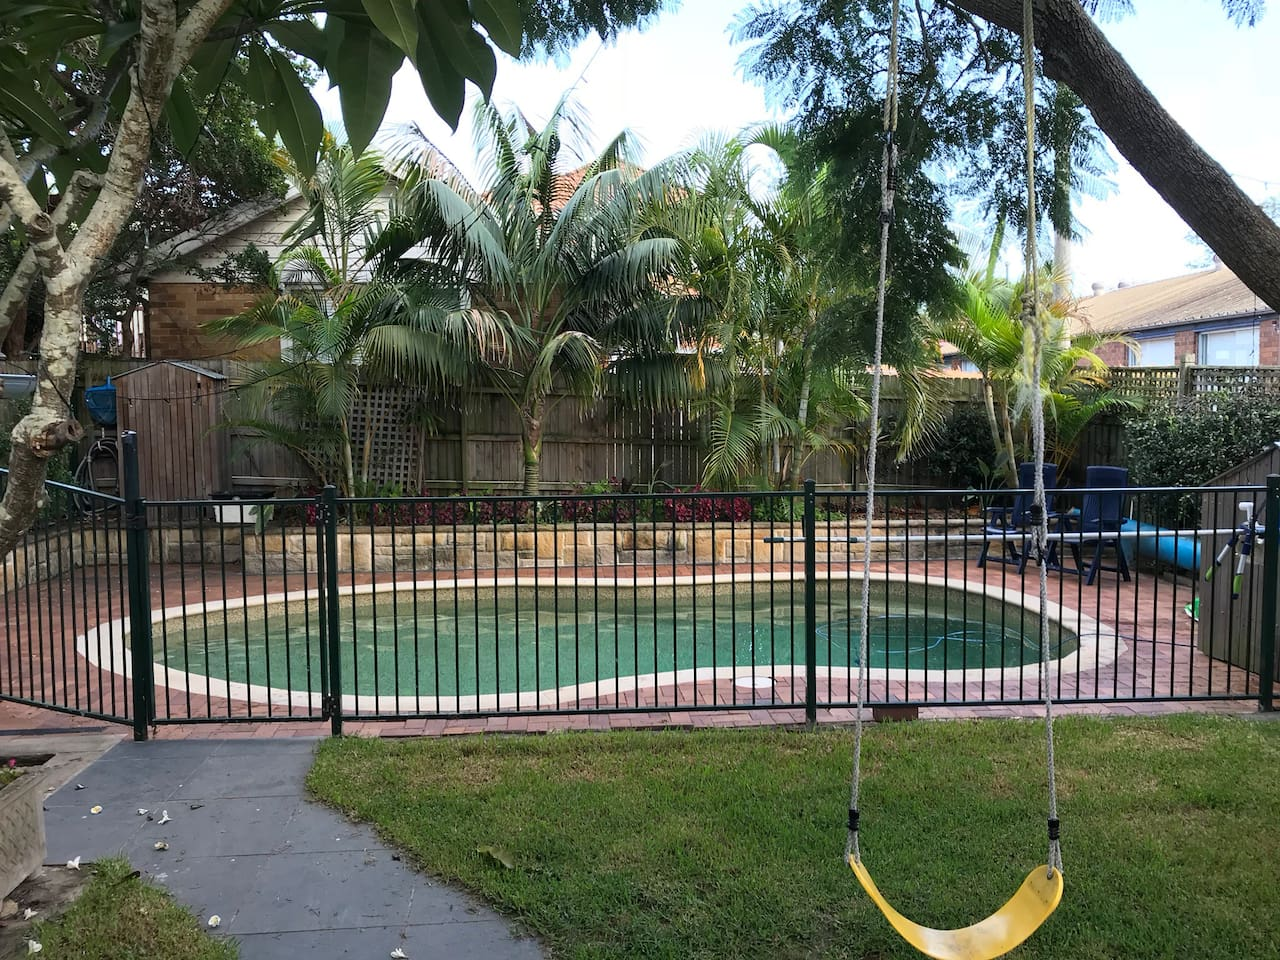 Salt chlorinated pool